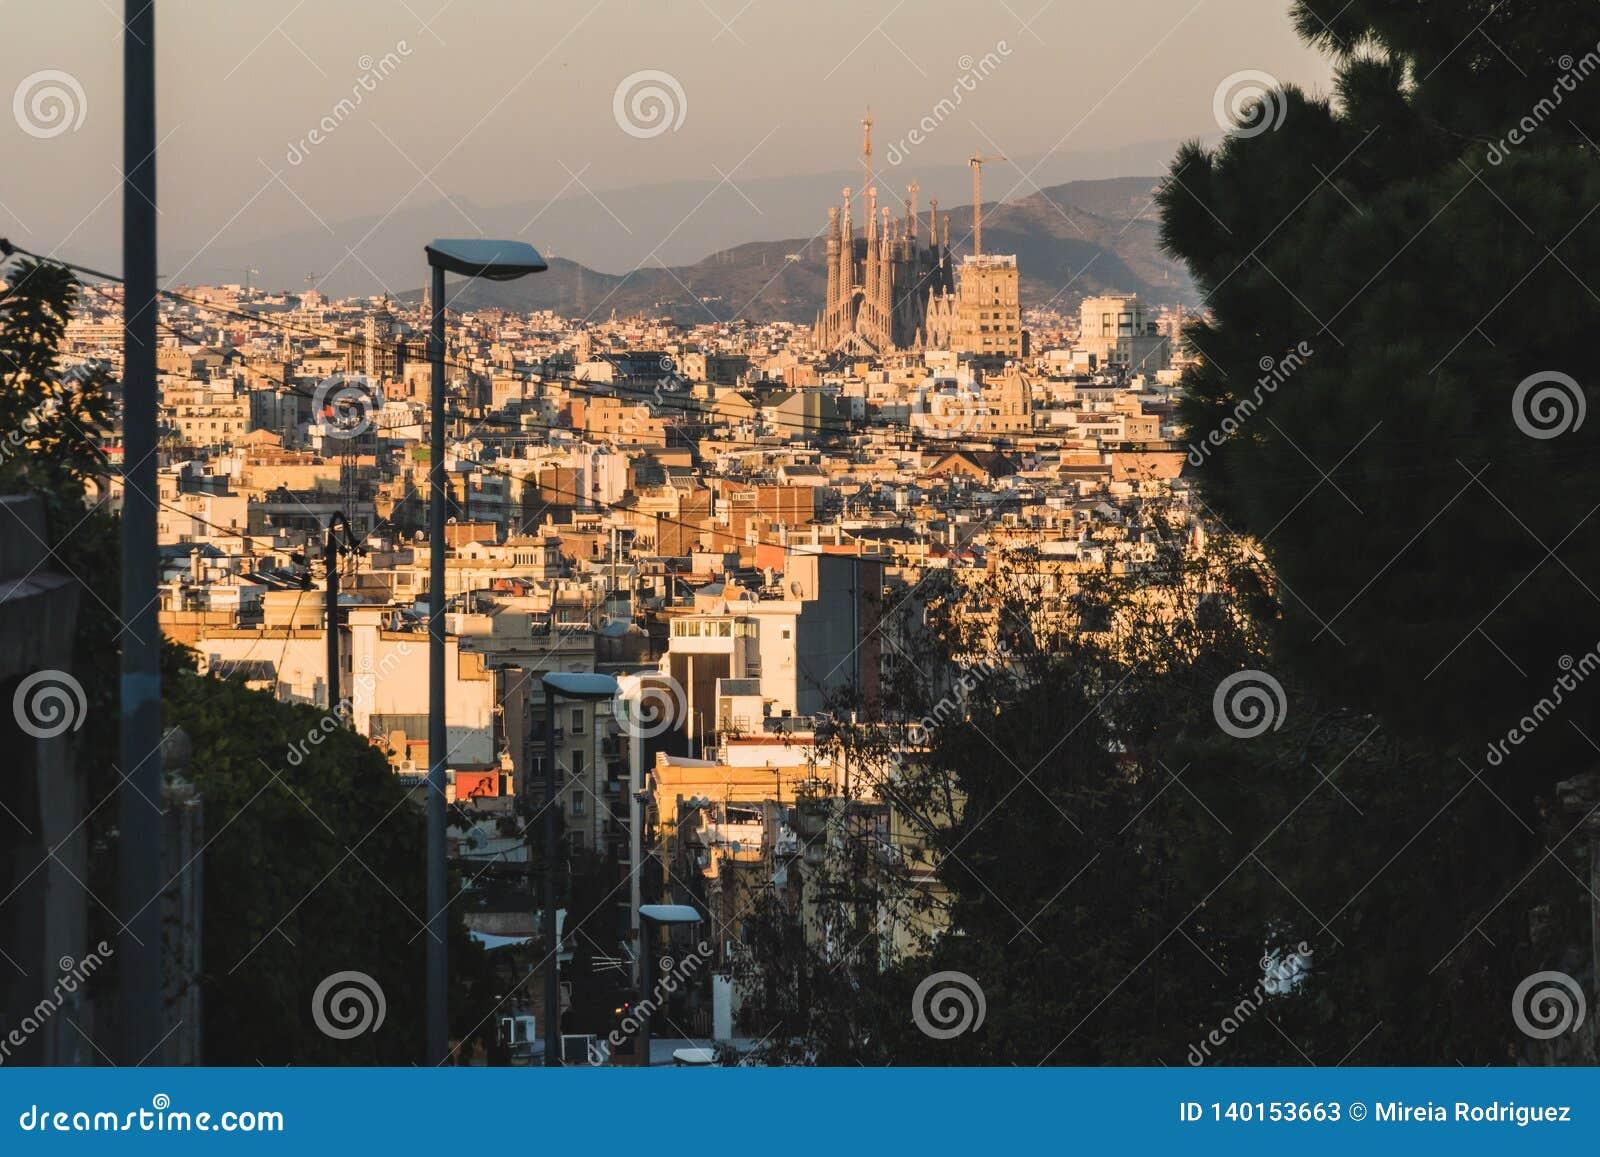 Sunset view of Barcelona skyline.